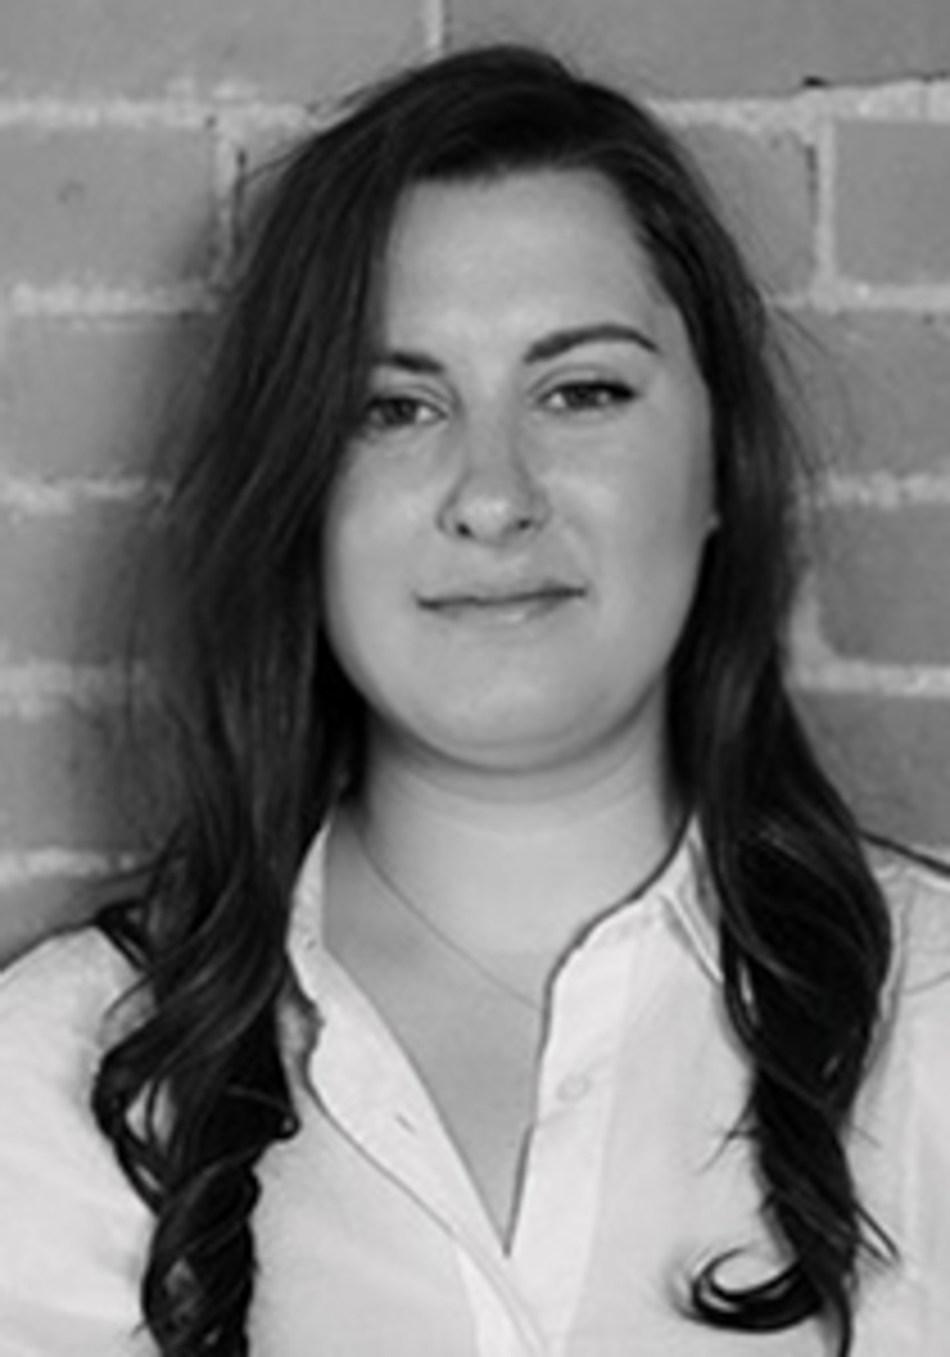 Lena Macdonald, winner of a 2019 FFF bursary for hostile environment training. (CNW Group/Canadian Journalism Forum on Violence and Trauma)